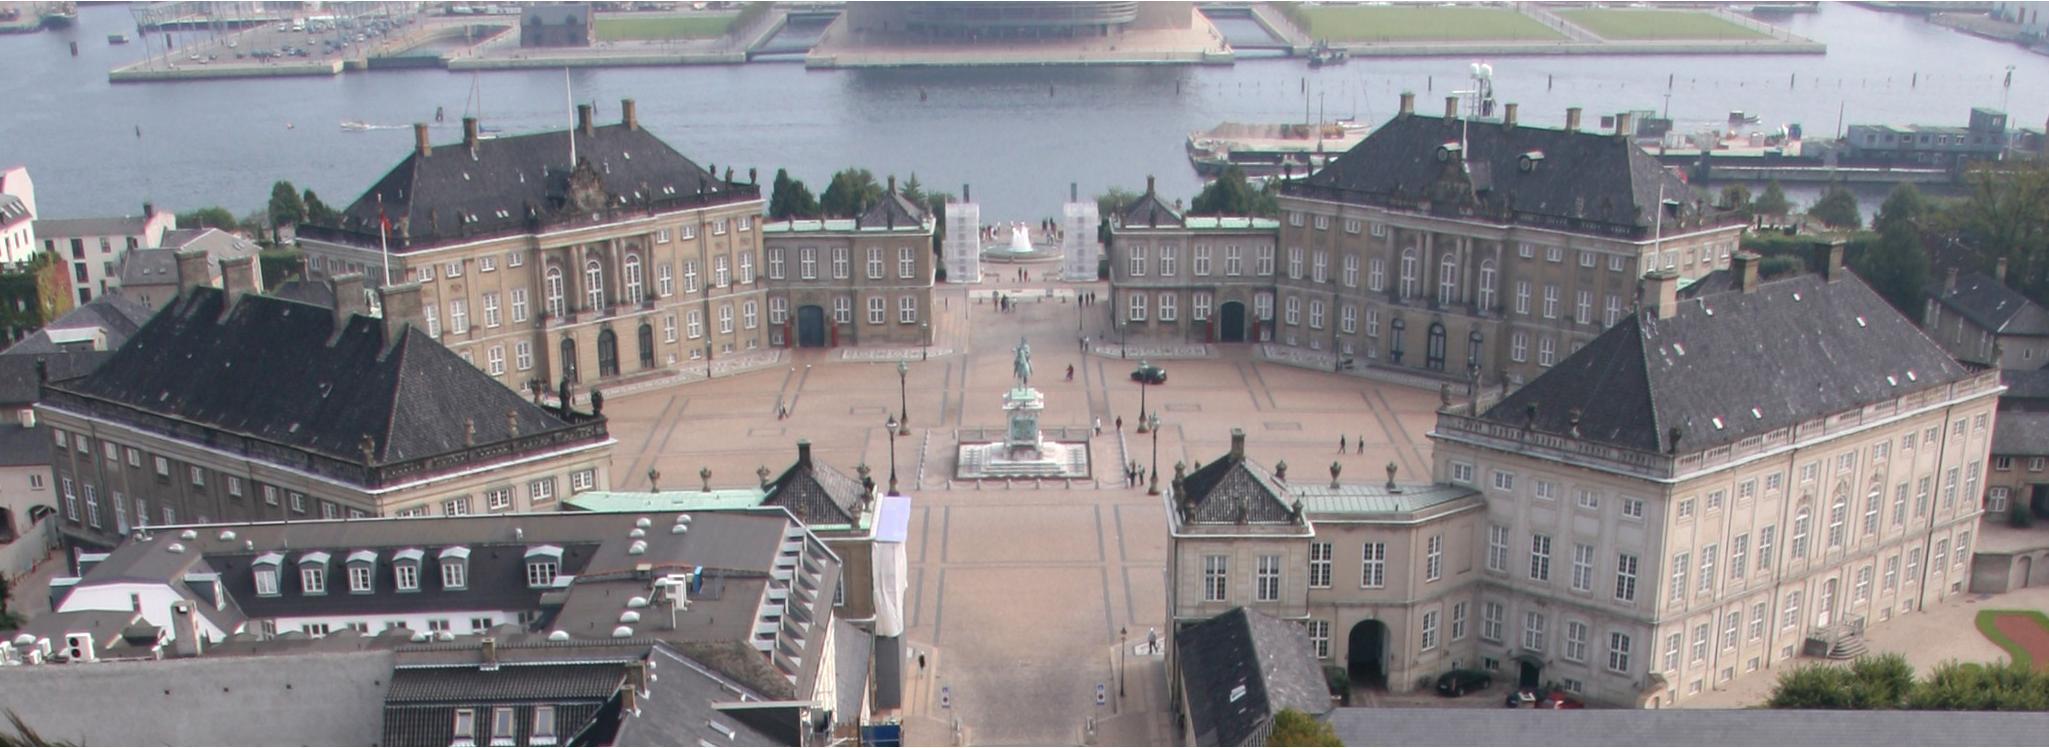 Amalienborg Wikipedia Den Frie Encyklopaedi